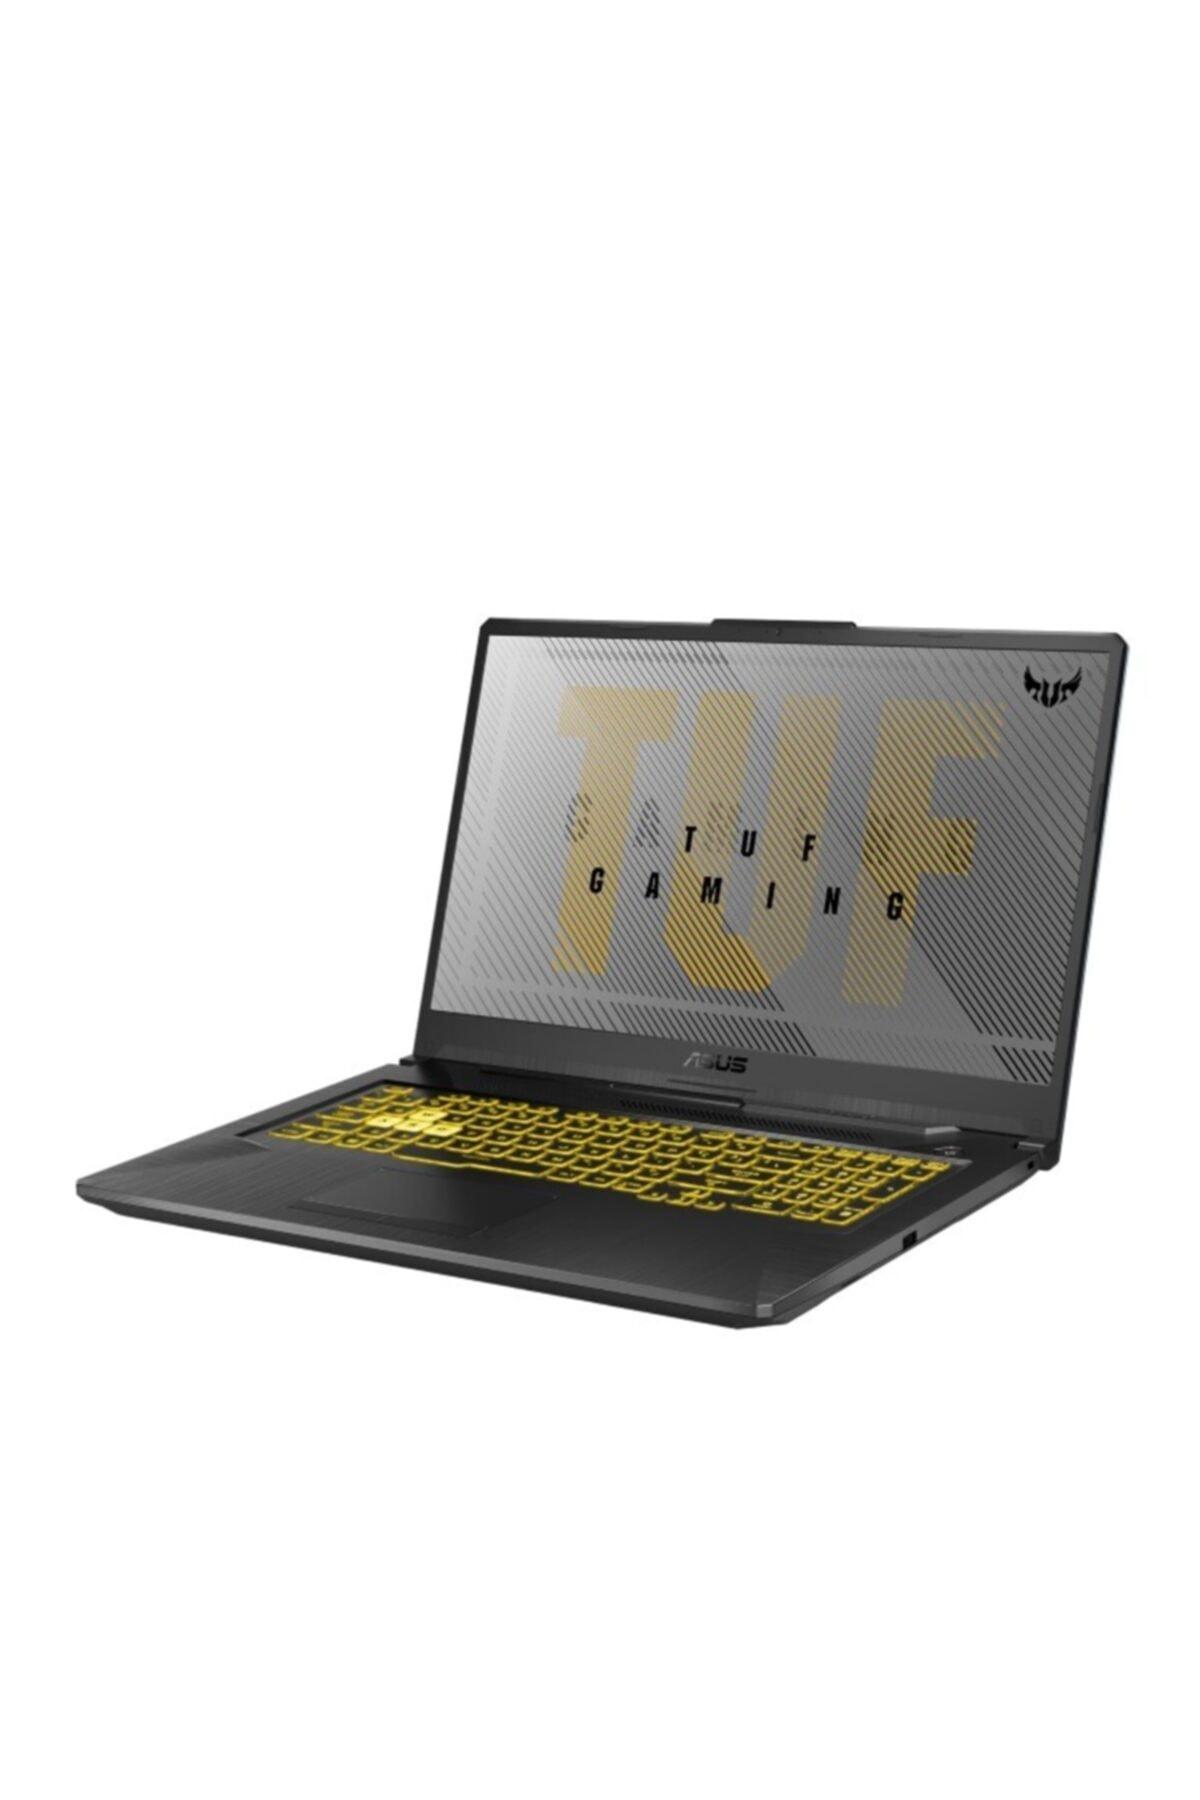 "ASUS Tuf Gaming F17 Fx706lı-hx198-gaming I5-10300h 16 Gb 512 Gb Ssd Gtx 1650 Ti 144hz Dos 17,3"" Fhd"